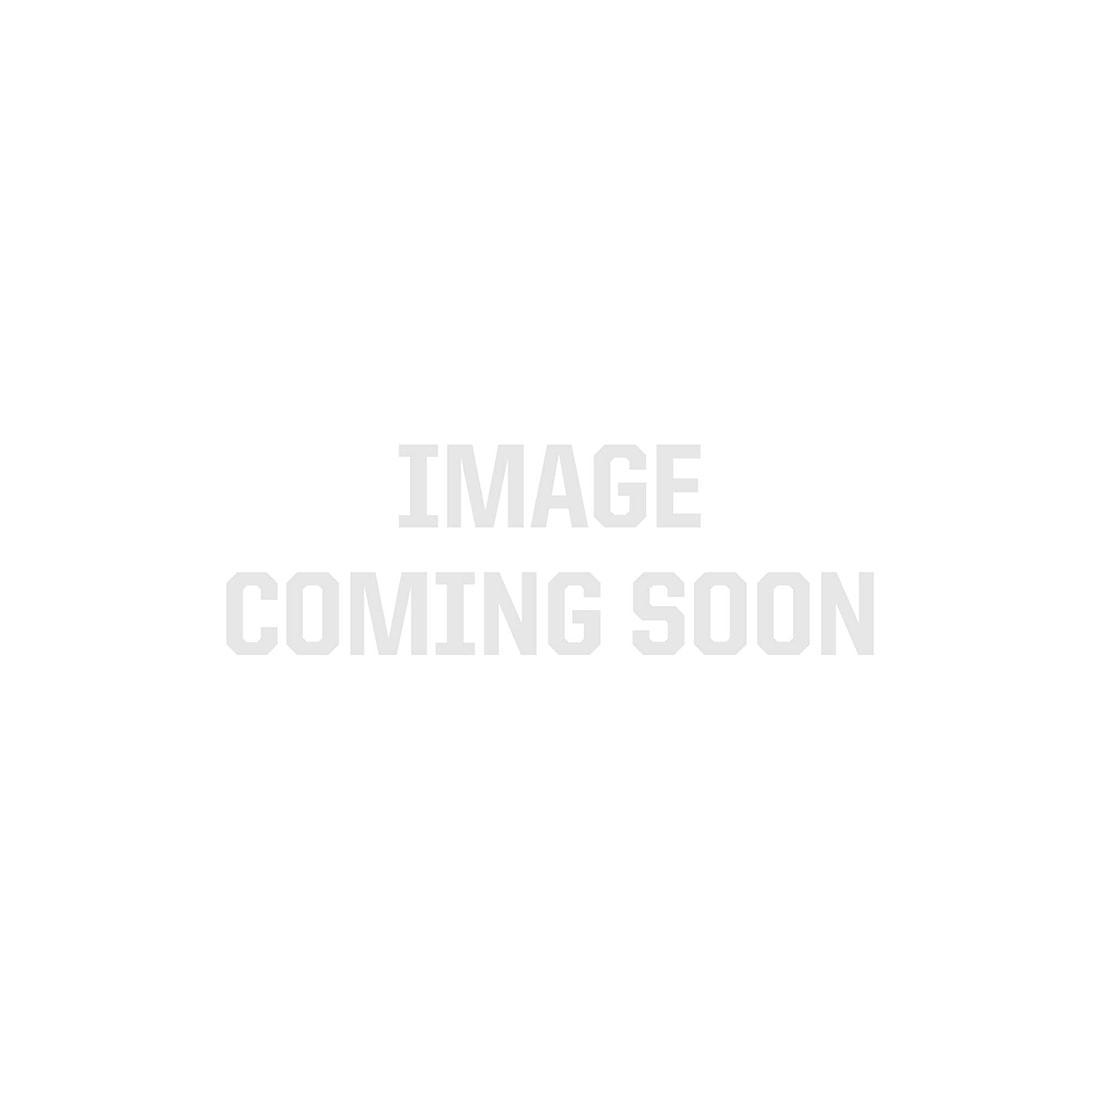 Zinc Mounting Bracket for Klus MICRO-ALU, PDS4-ALU, PDS-O Aluminum Channels